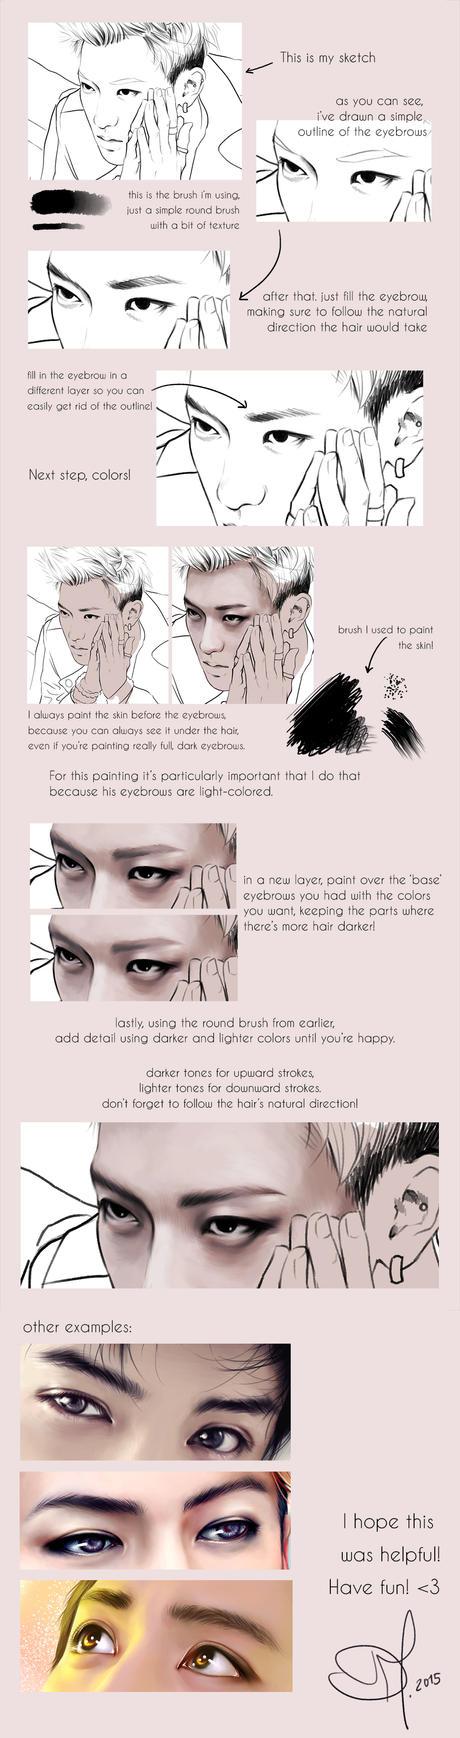 Eyebrow Tutorial by RollingAlien